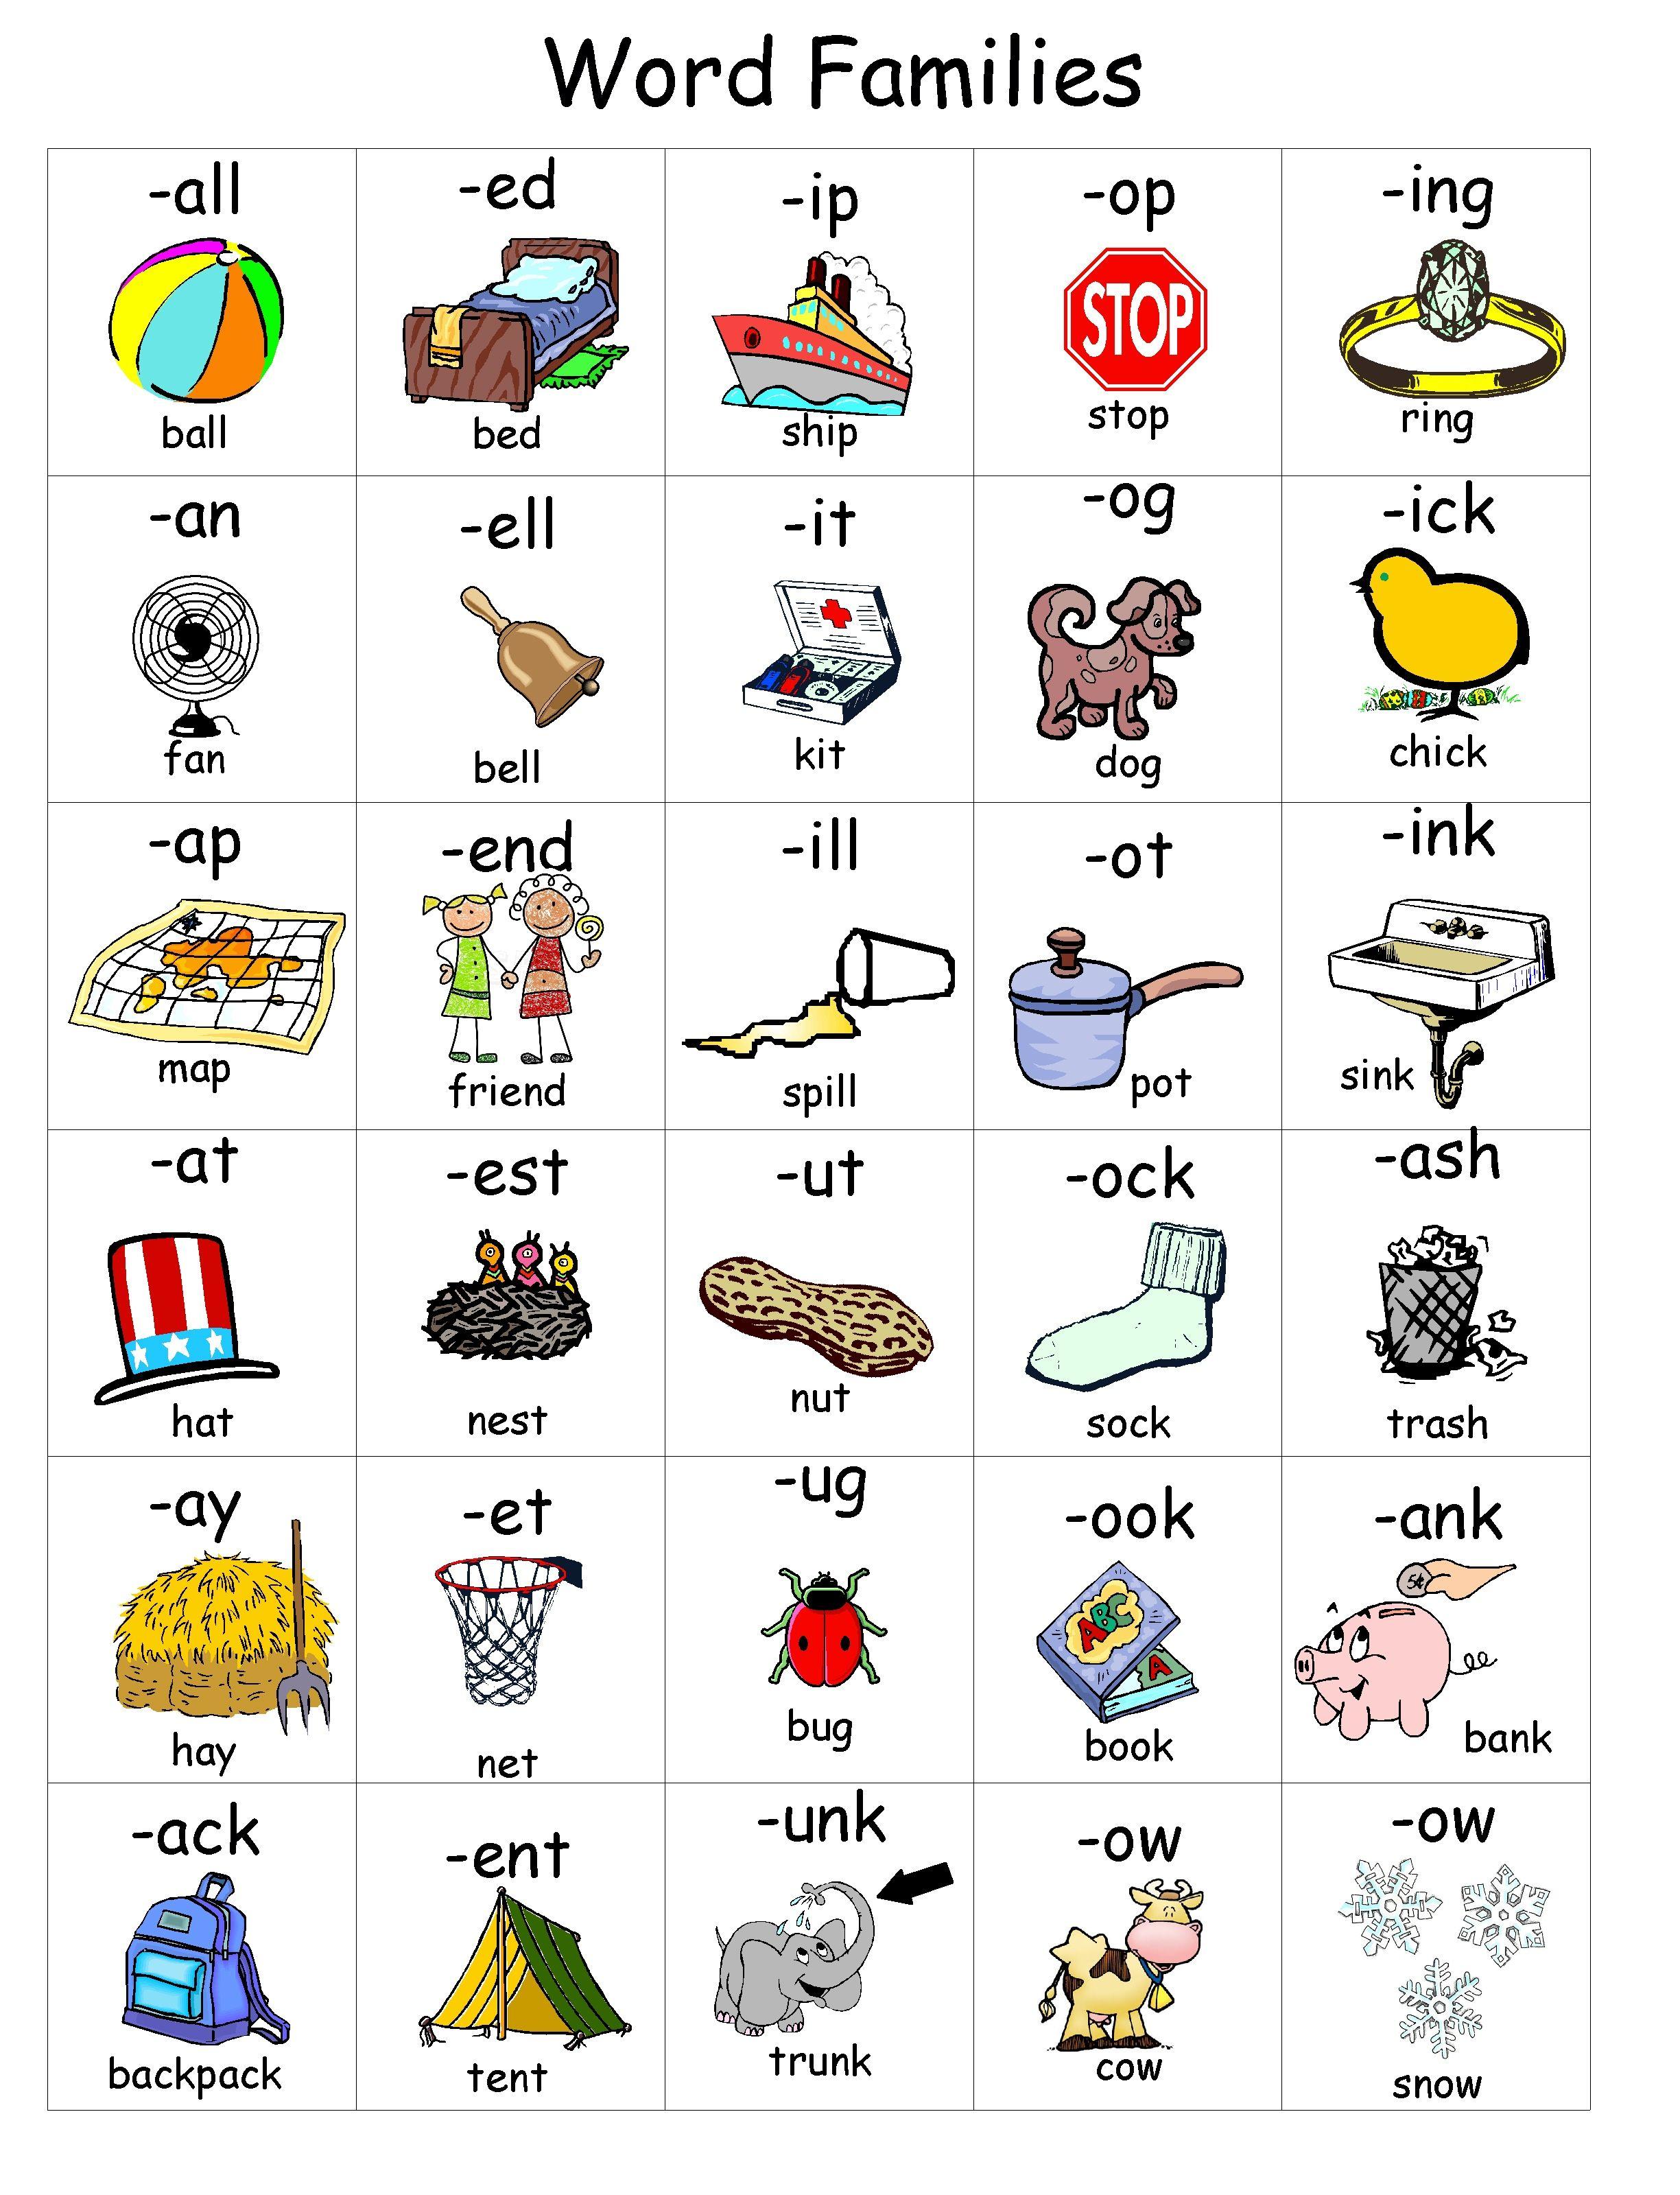 Word Families Chart Free From Teachers Pay Teachers